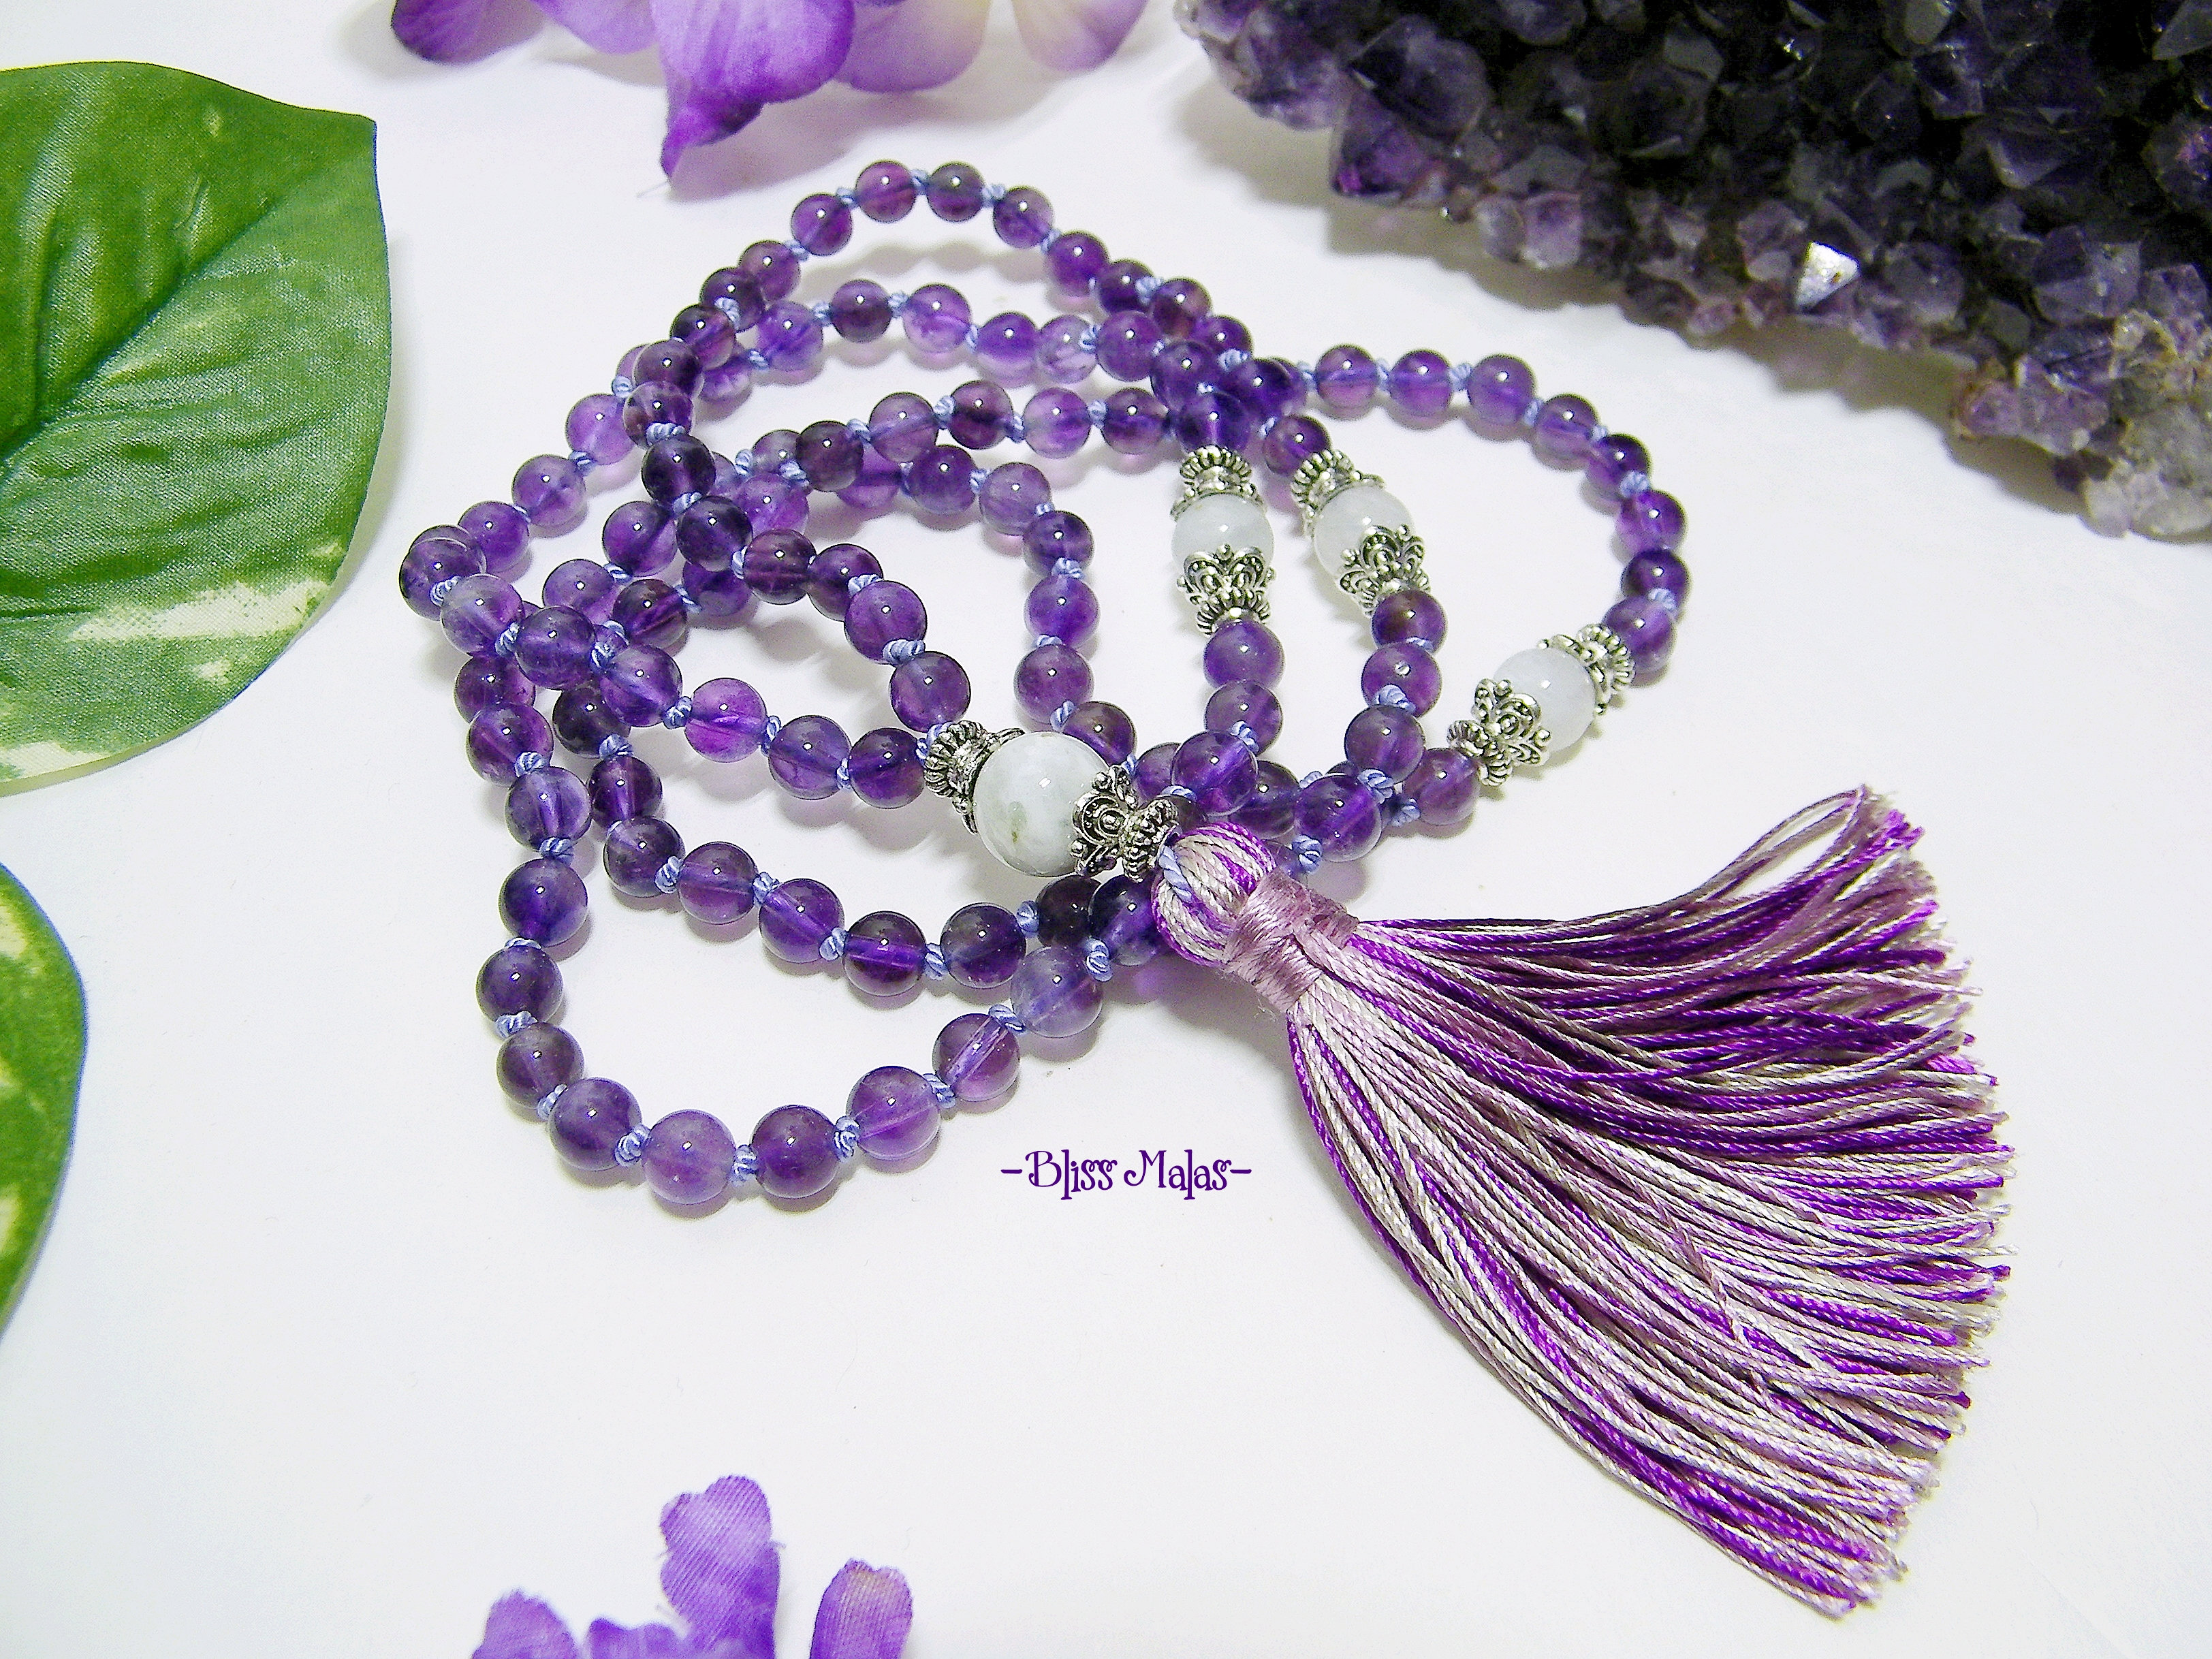 Mother of Pearl Quartz; Handmade Knotted; 108 x 6mm Gemstone Necklace; Purple MALA PRAYER BEADS w Genuine Amethyst